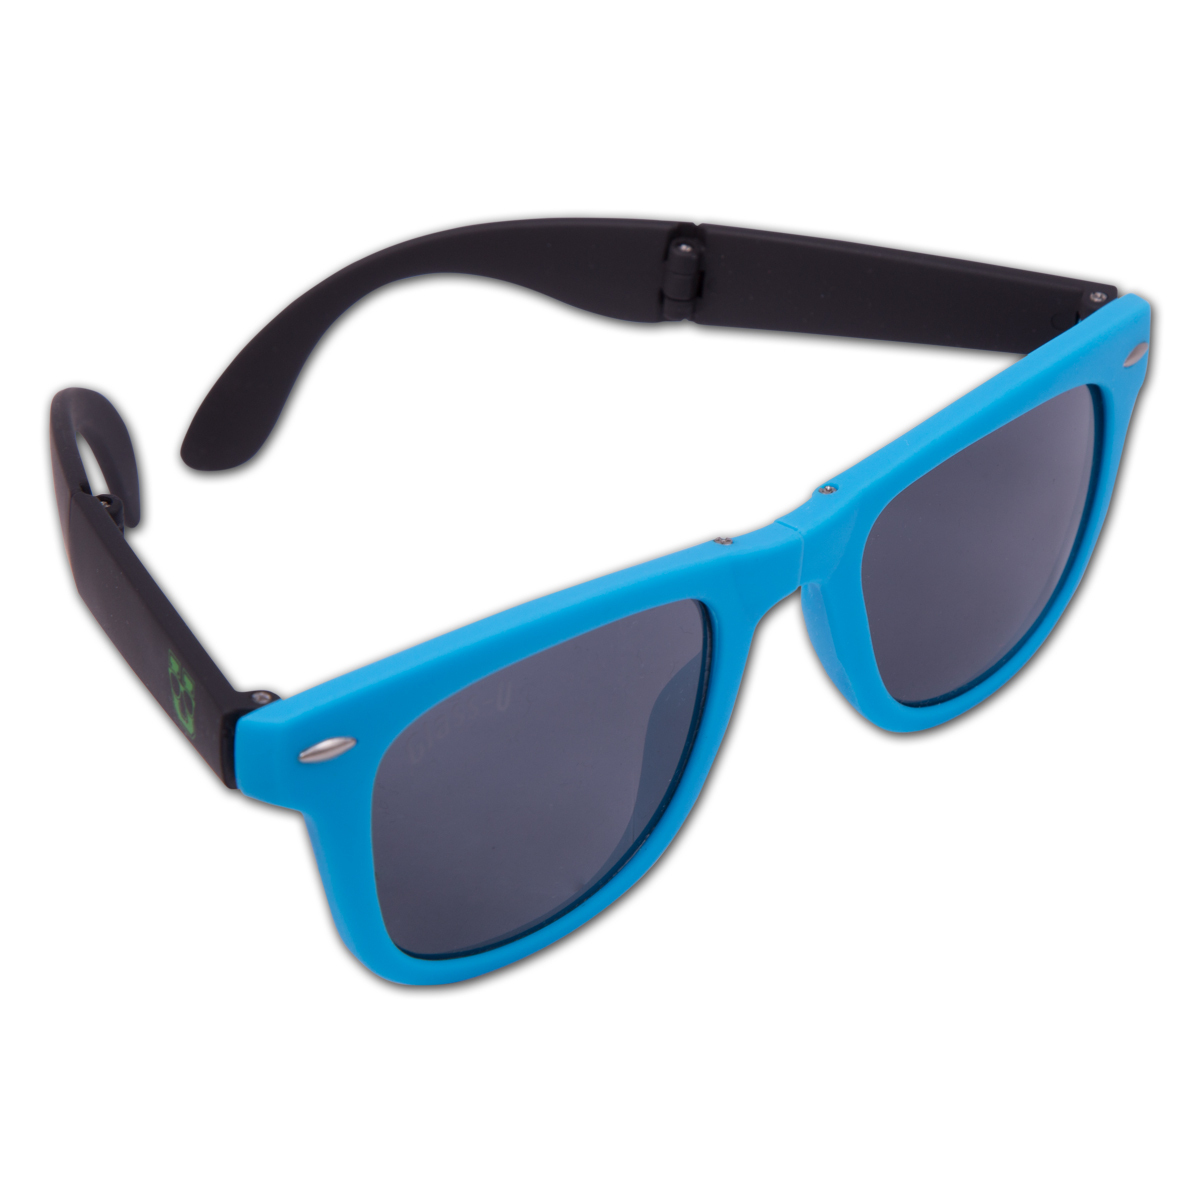 2014 Bonnaroo Sunglasses by Glass-U